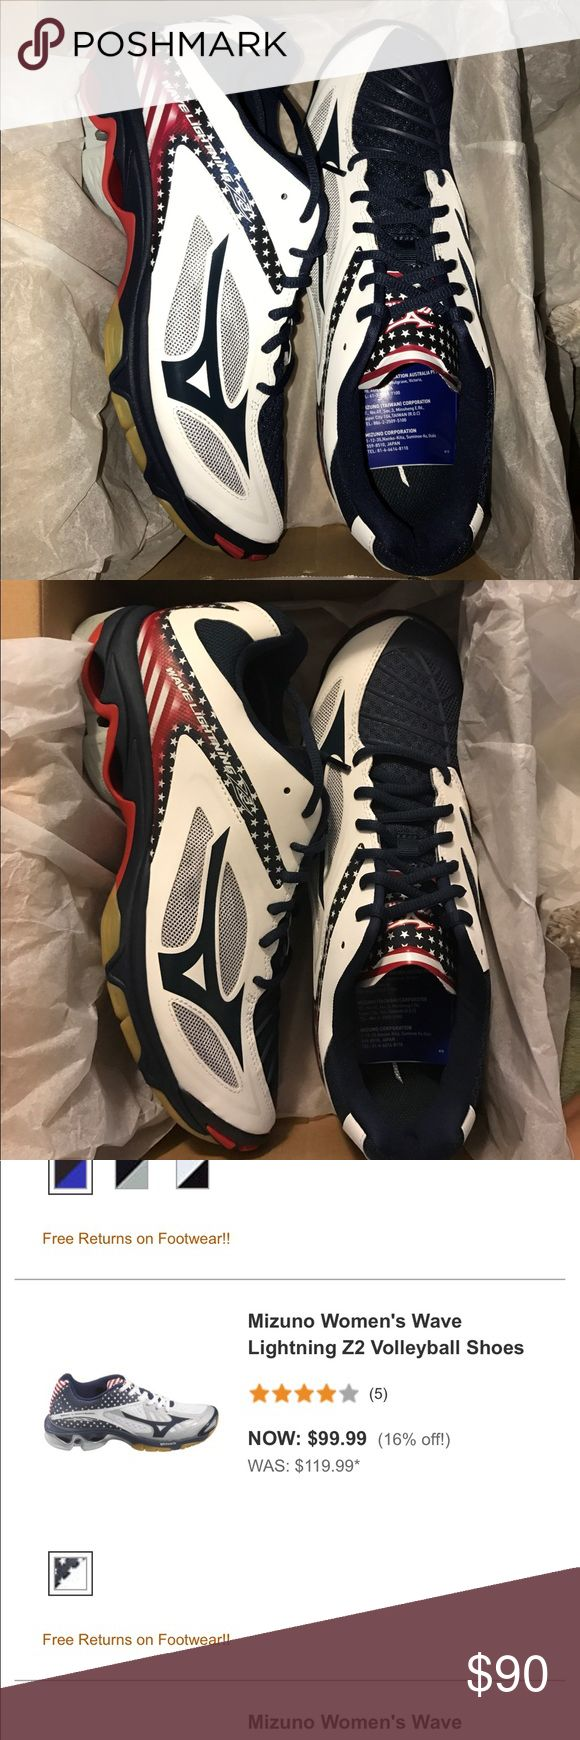 never worn mizuno volleyball shoes mizuno volleyball shoes Mizuno Shoes Athletic Shoes